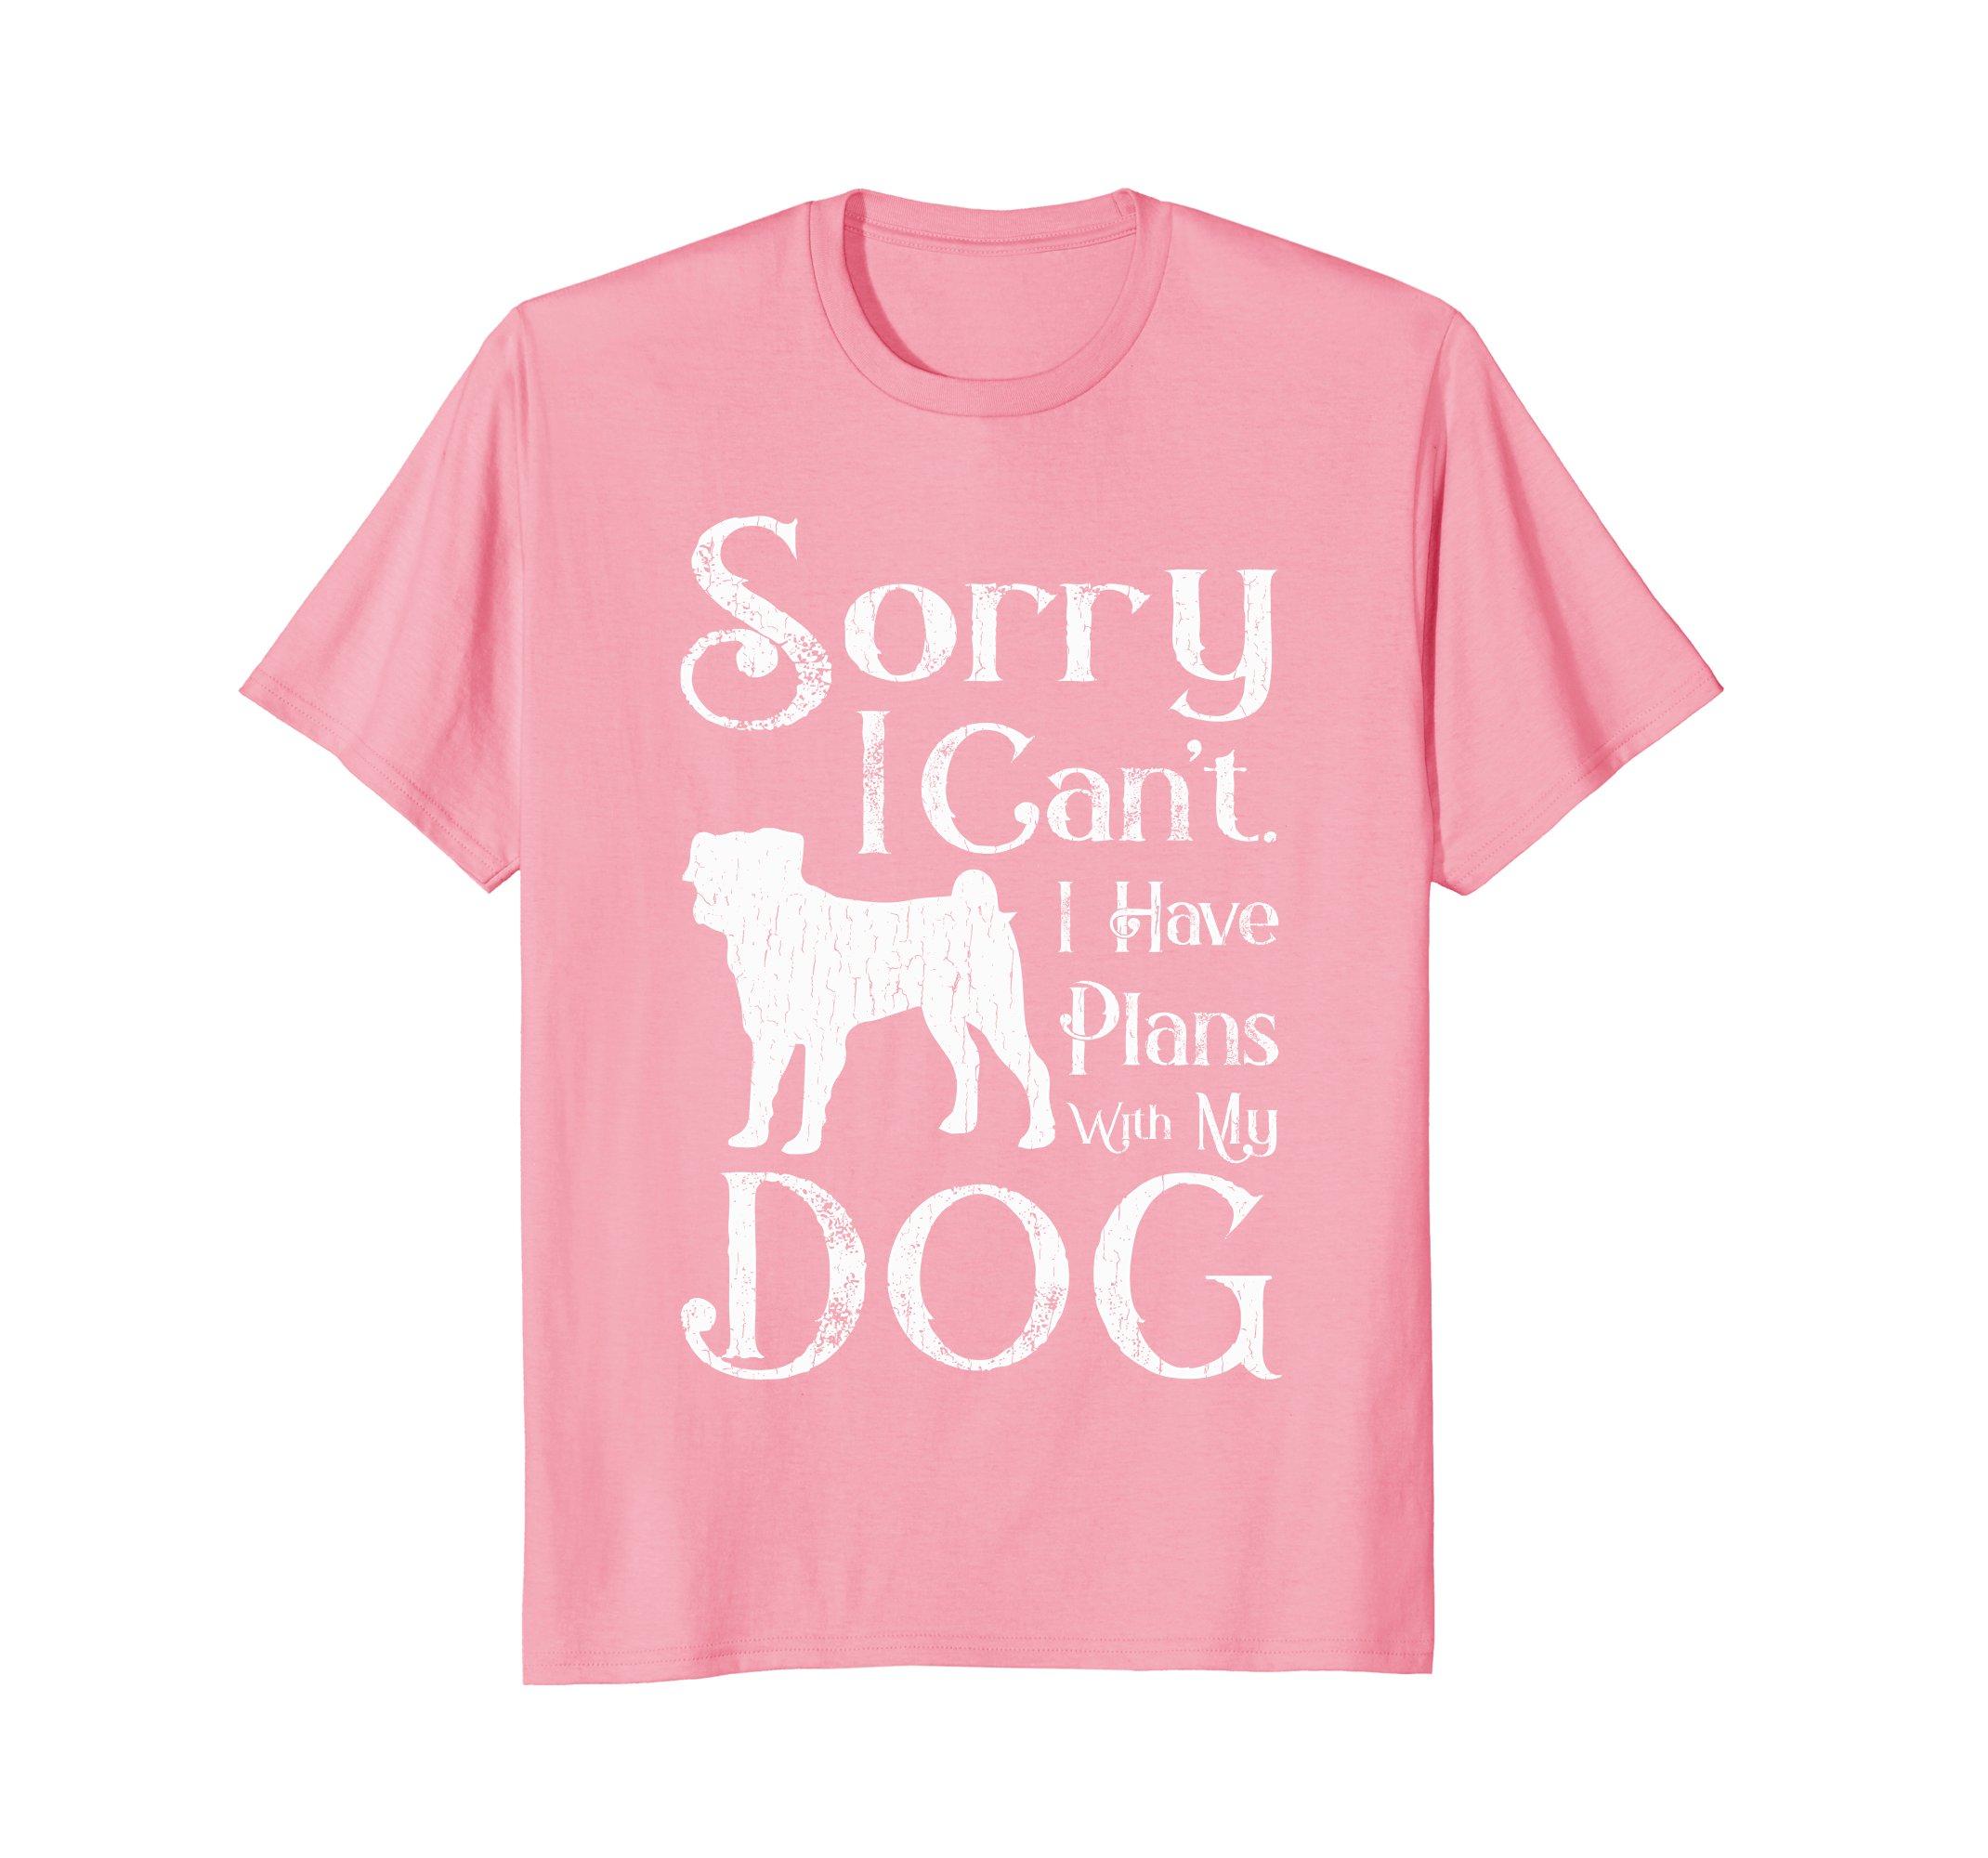 f44fe9a7 Sorry I Can't. I Have Plans With My Dog T-shirt – PetDazz.com ...